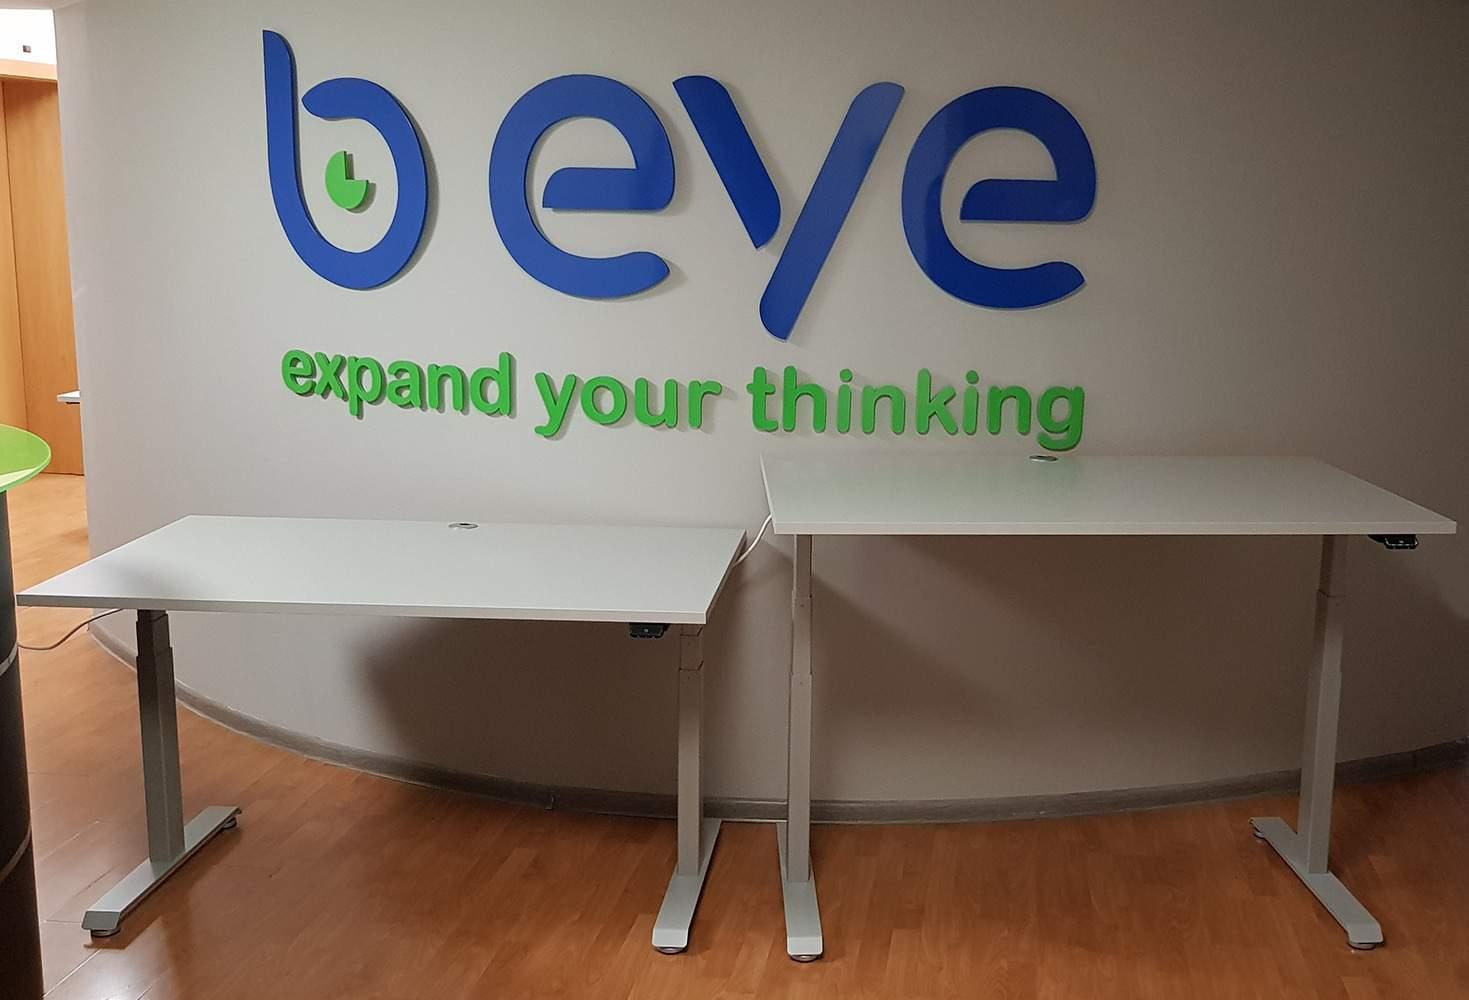 Electric height adjustable desks BulDesk Pro in offices of B EYE